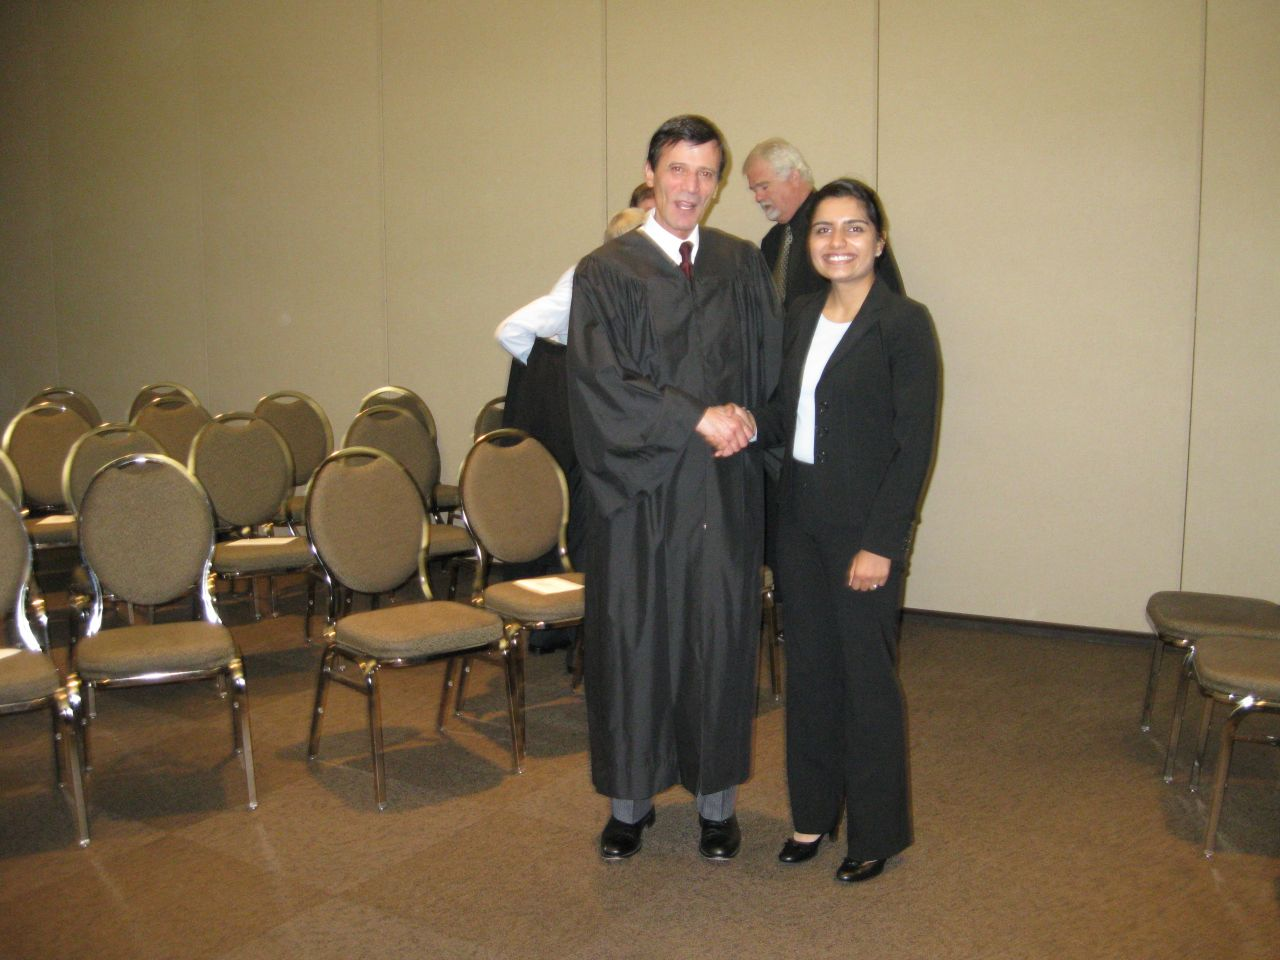 Justice Tom M. Lytton and new admittee Uttara Arora